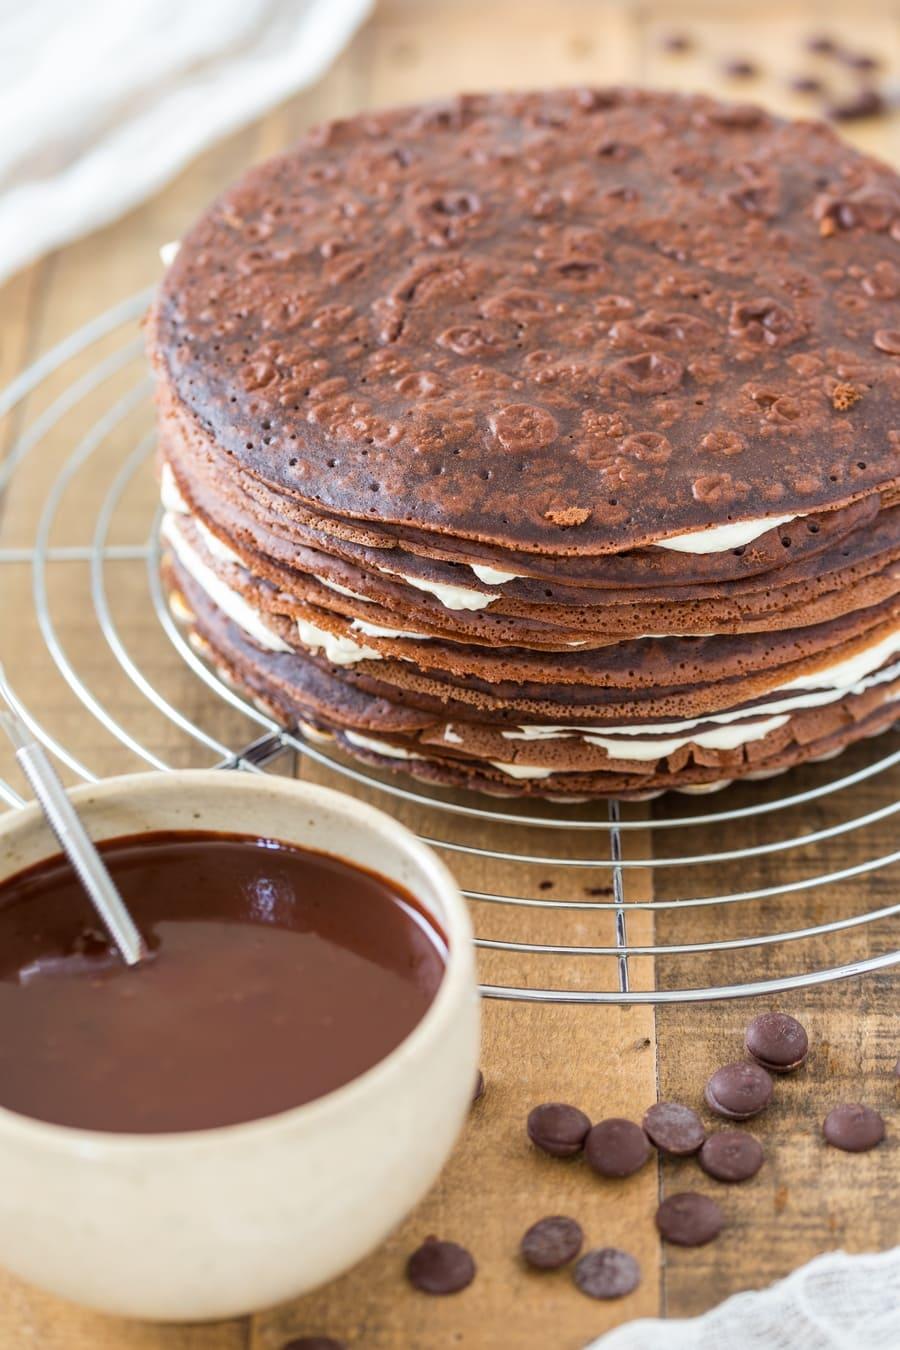 Naked Black Forest crepe cake before adding the chocolate ganache.